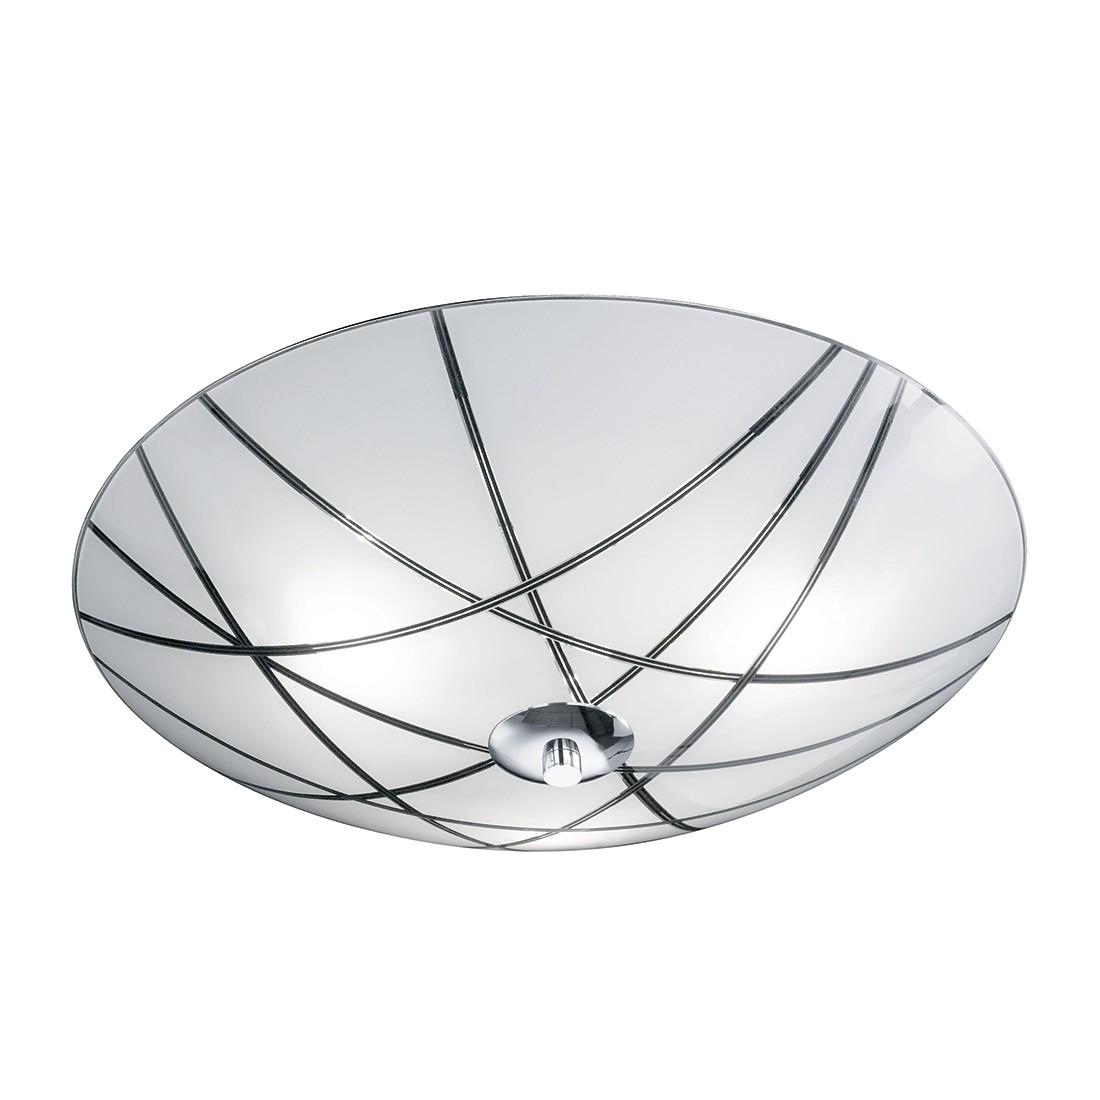 energie  A++, Plafondlamp Mats - metaal/zilverkleurig glas 3 lichtbronnen, Honsel